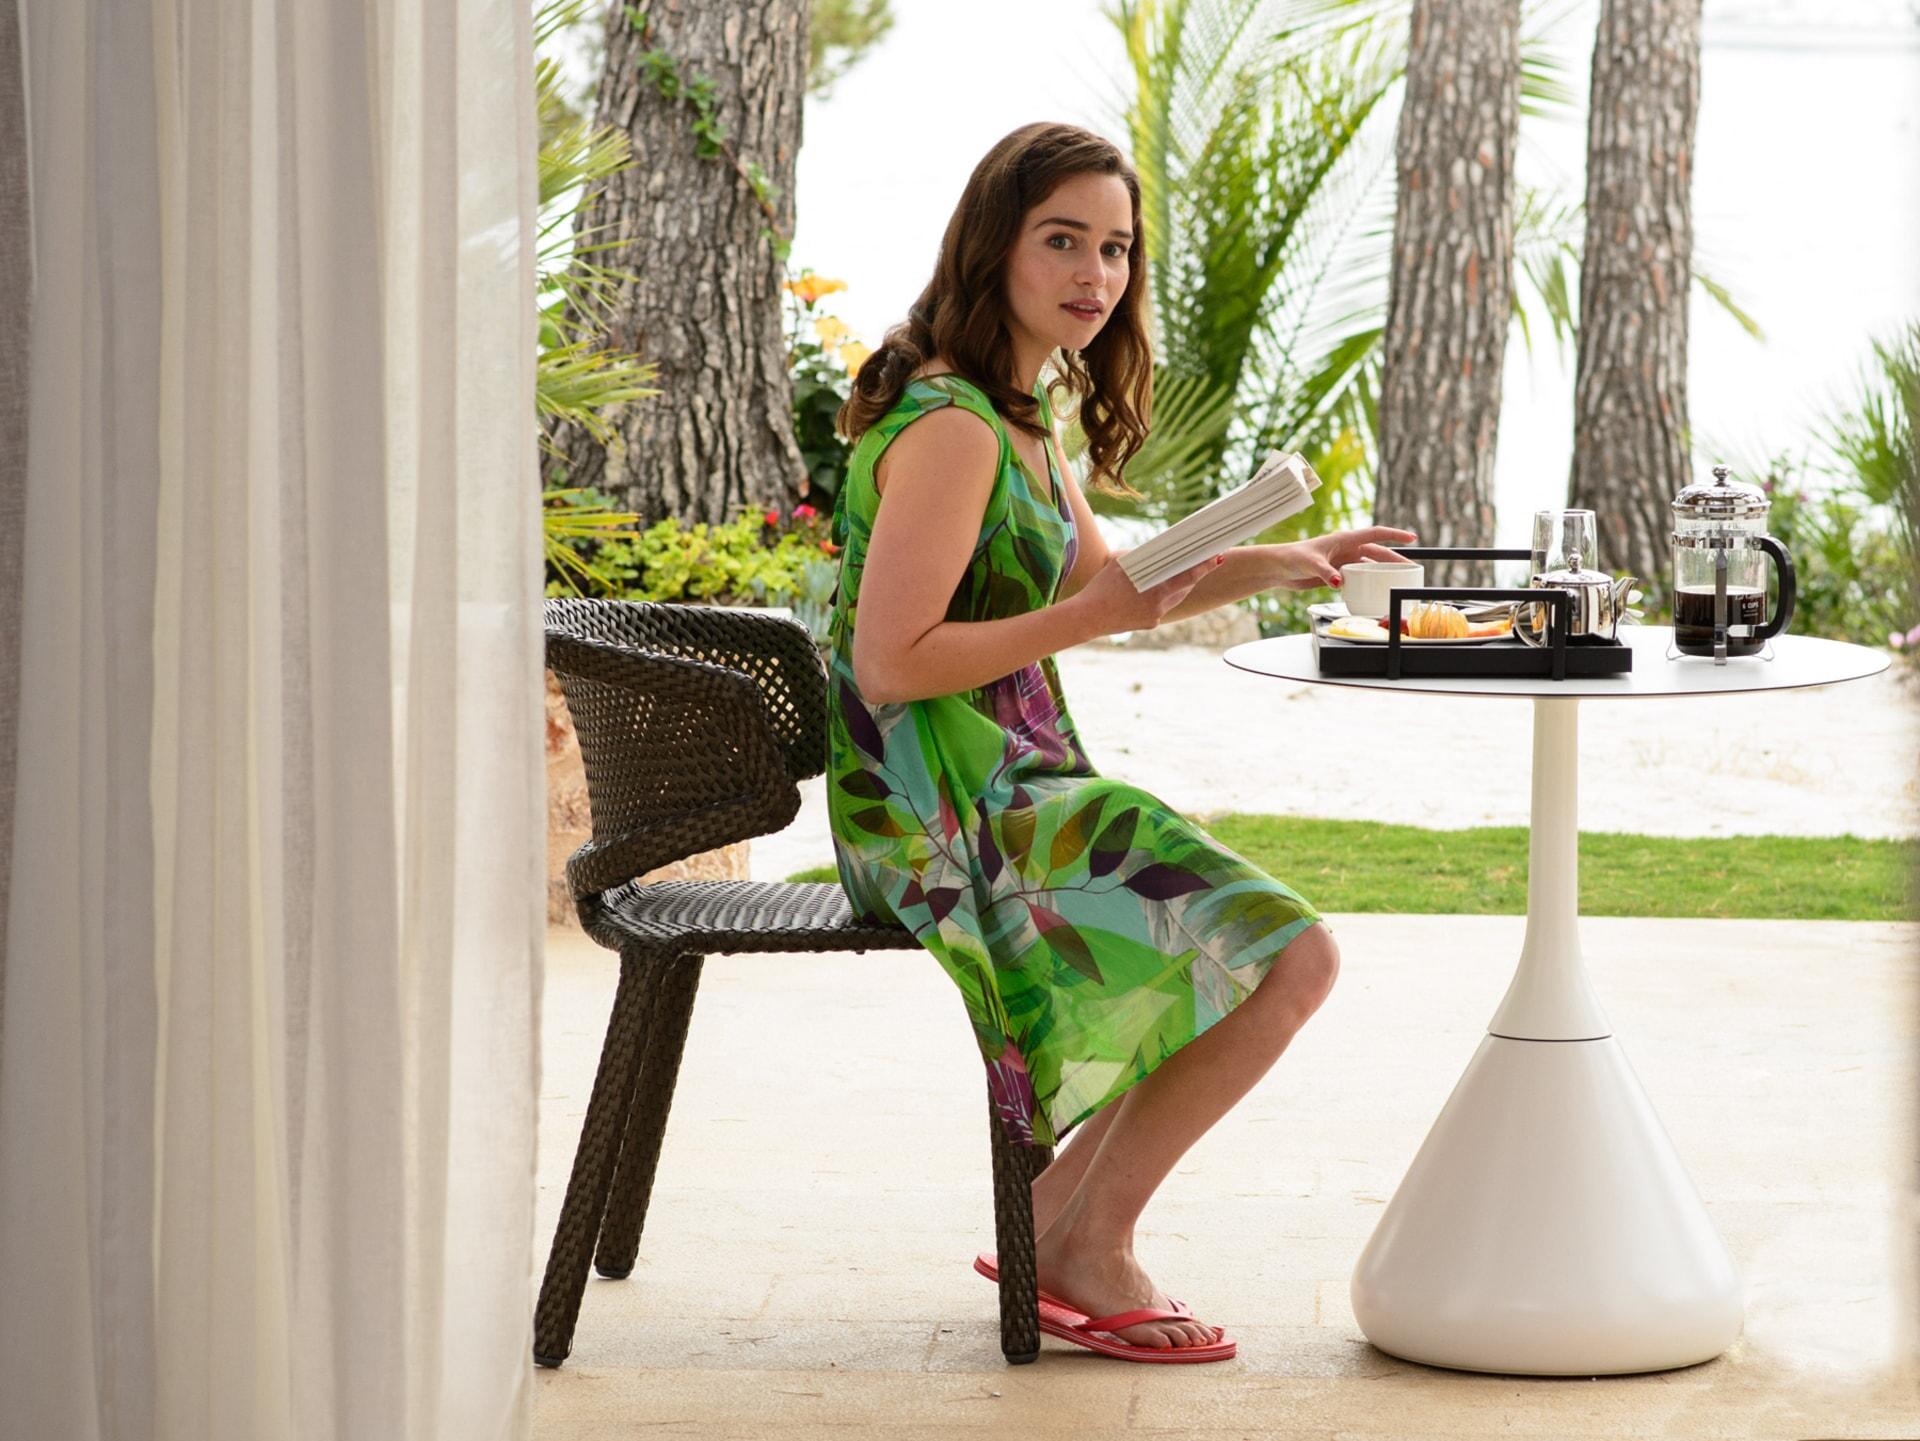 EMILIA CLARKE as Lou Clark eating breakfast outdoors in a tropical setting.